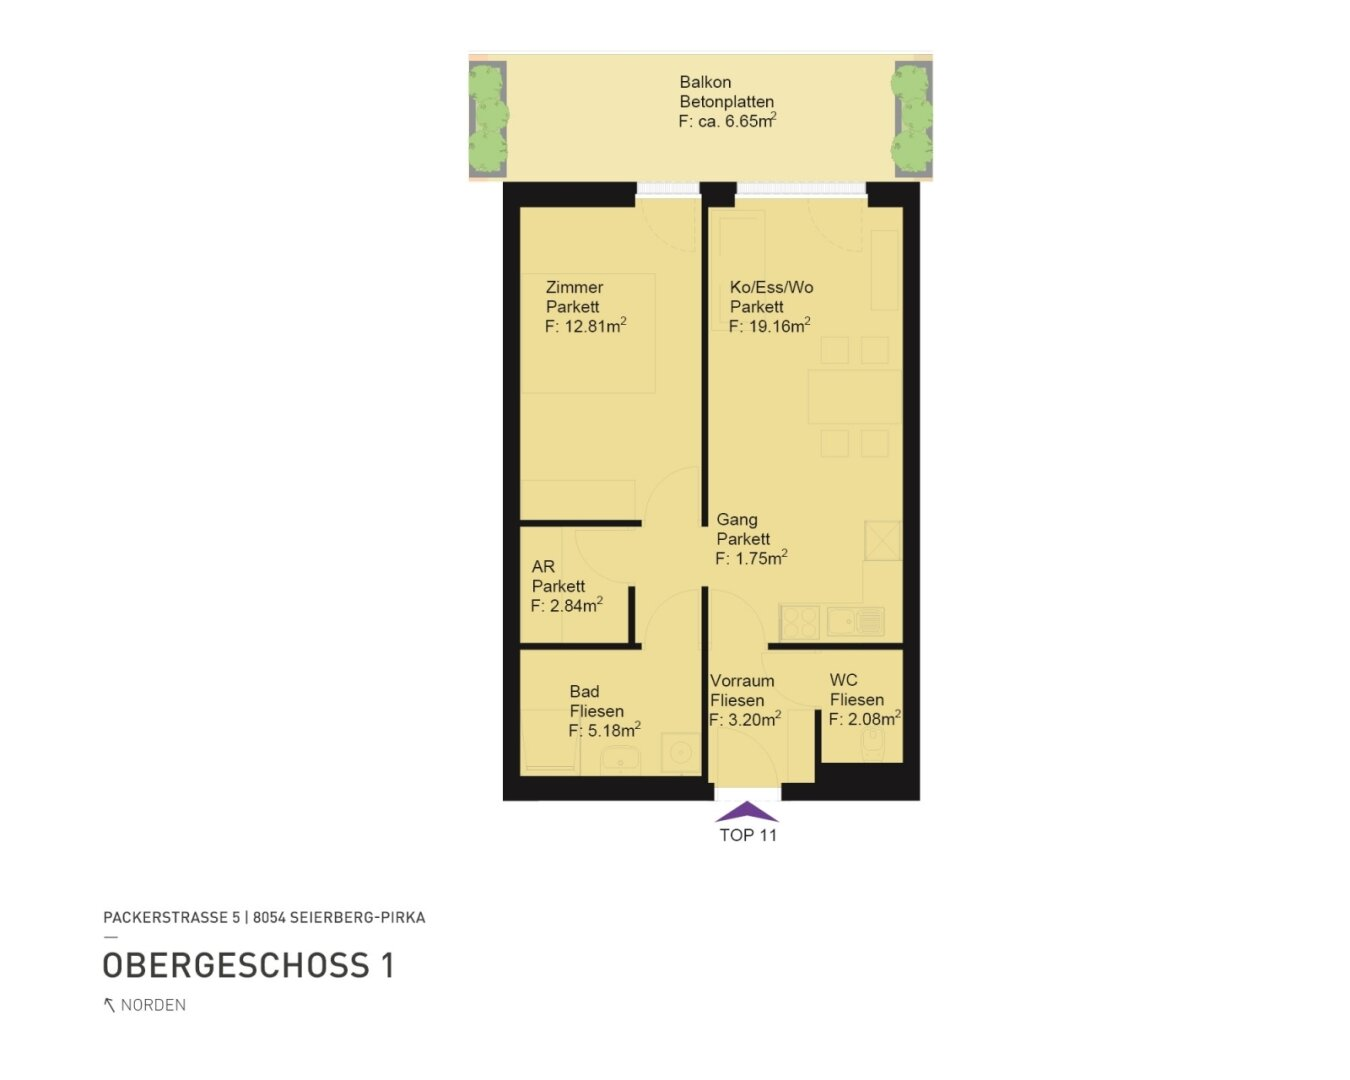 Grundriss: Packerstraße 5 -8054 Seiersberg-Pirka